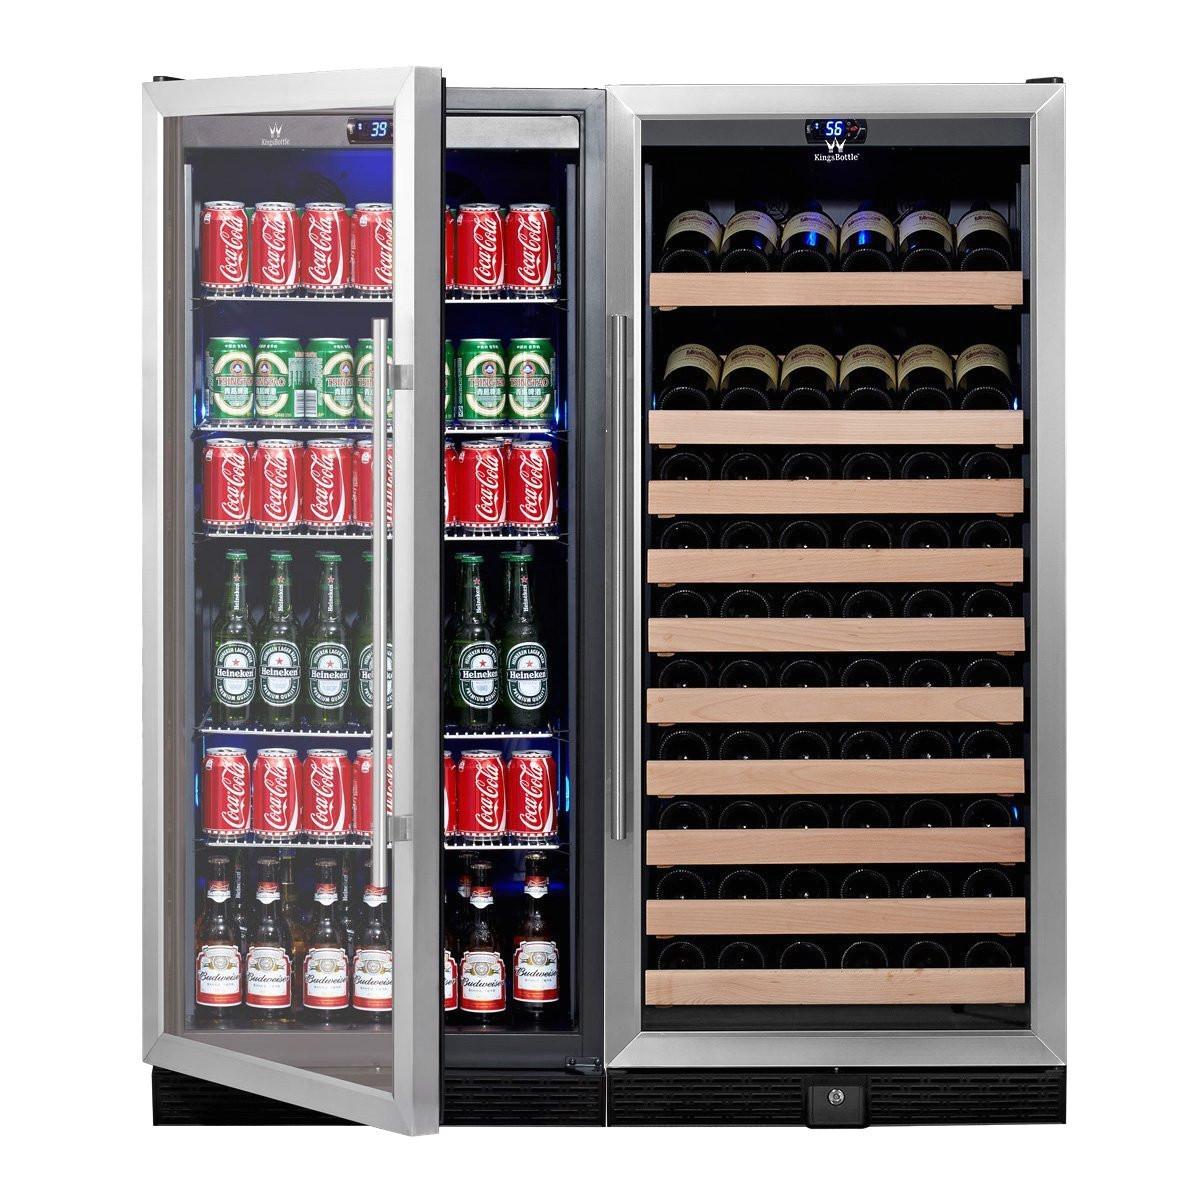 amazon com kingsbottle 2 zone large wine beverage fridge 397 pounds combo fridge holds 300 beer cans 98 wine or beverage bottles